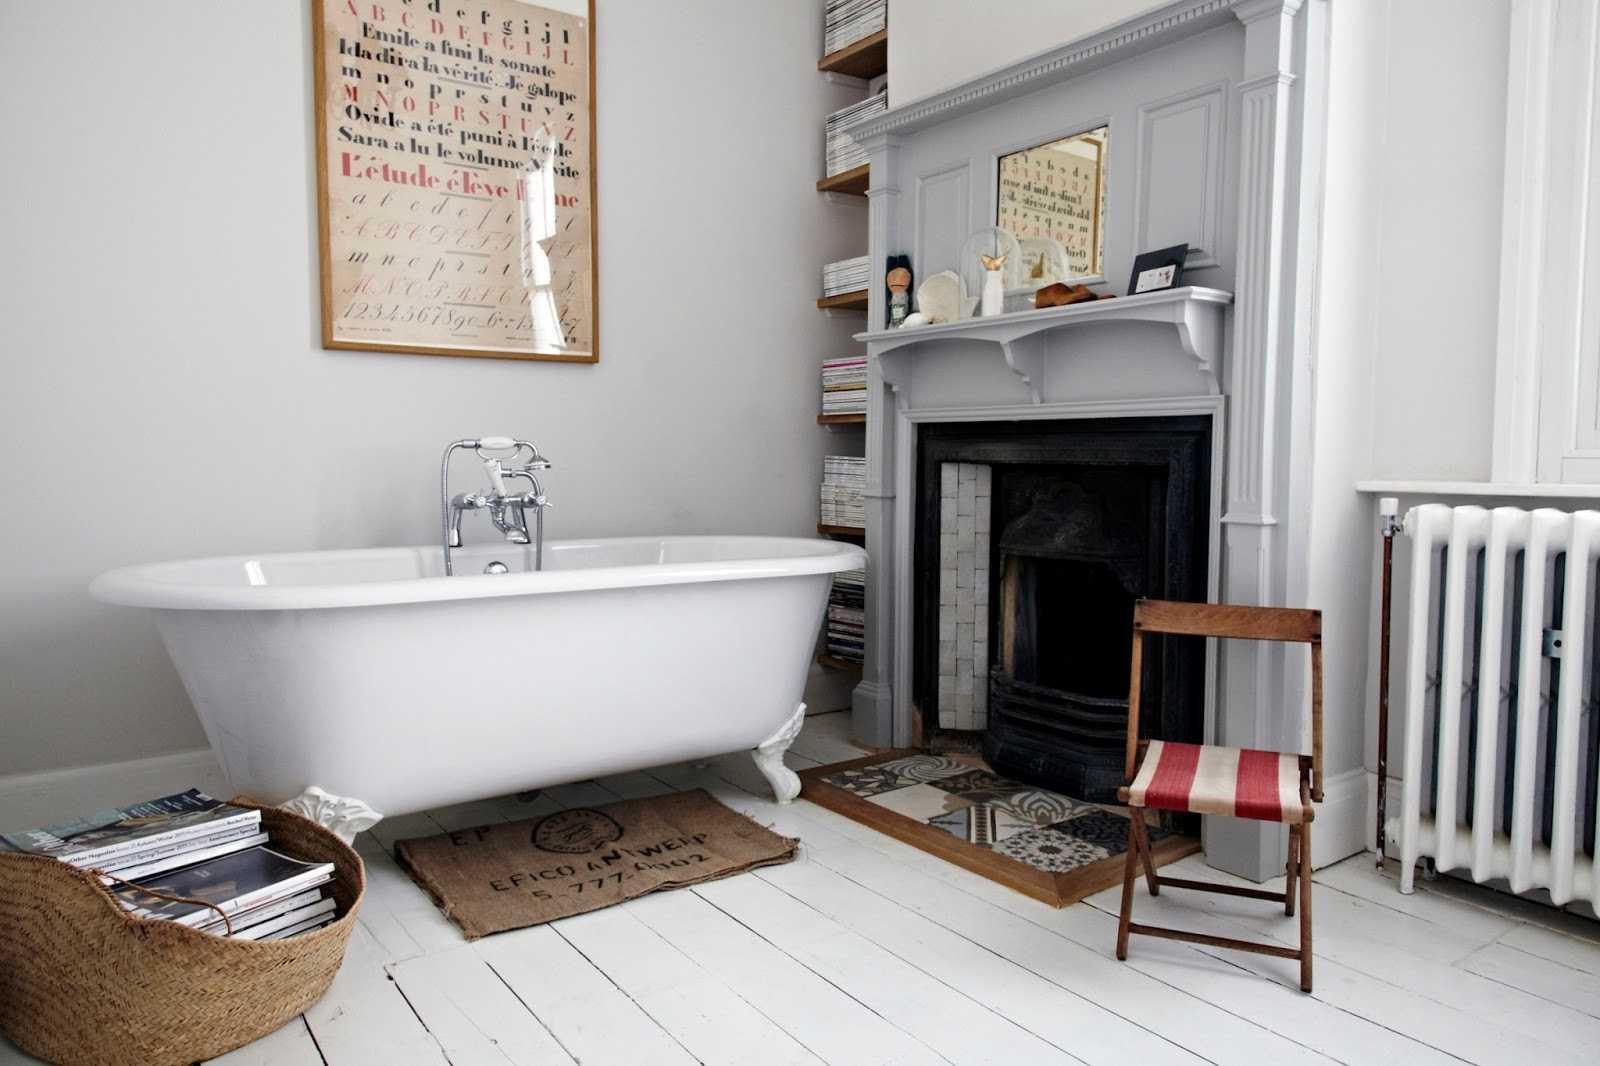 Petite salle de bain retro: salle de bain baignoire sur pied ...